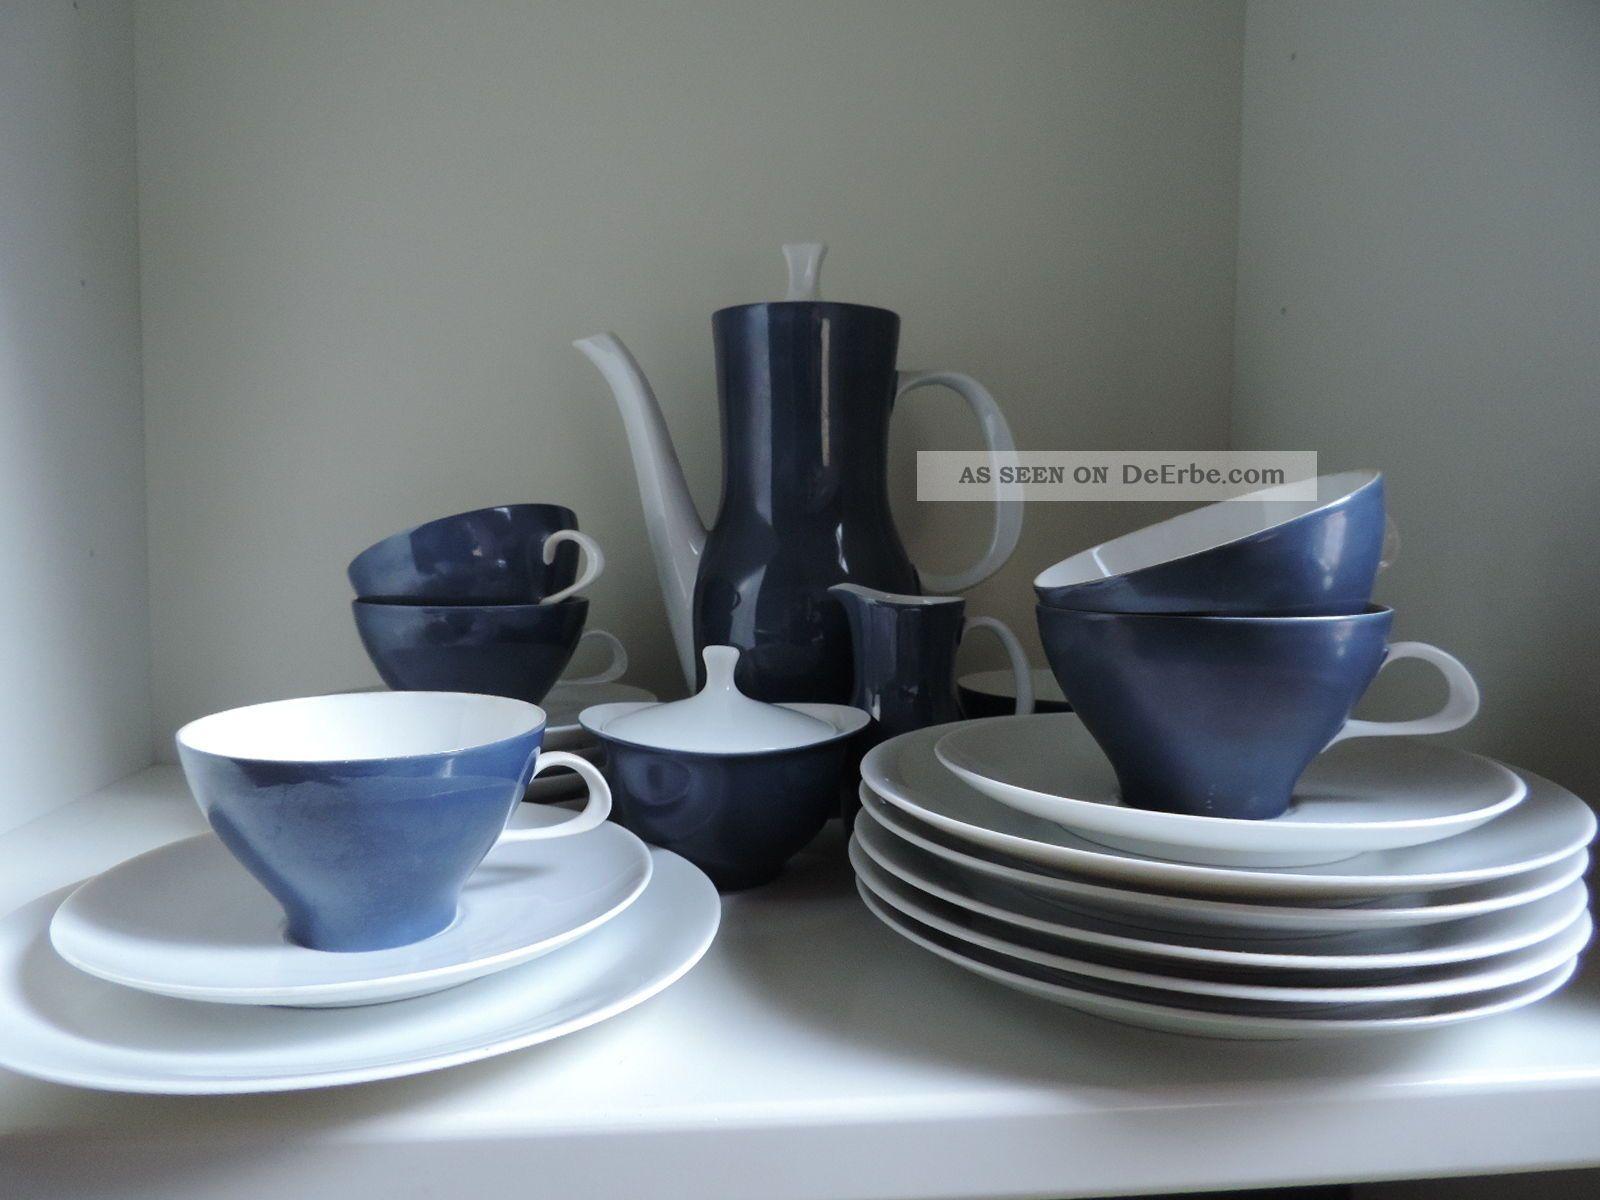 thomas finlandia blaufond kaffeeservice f 6 personen tapio wirkkala 60er jahre. Black Bedroom Furniture Sets. Home Design Ideas